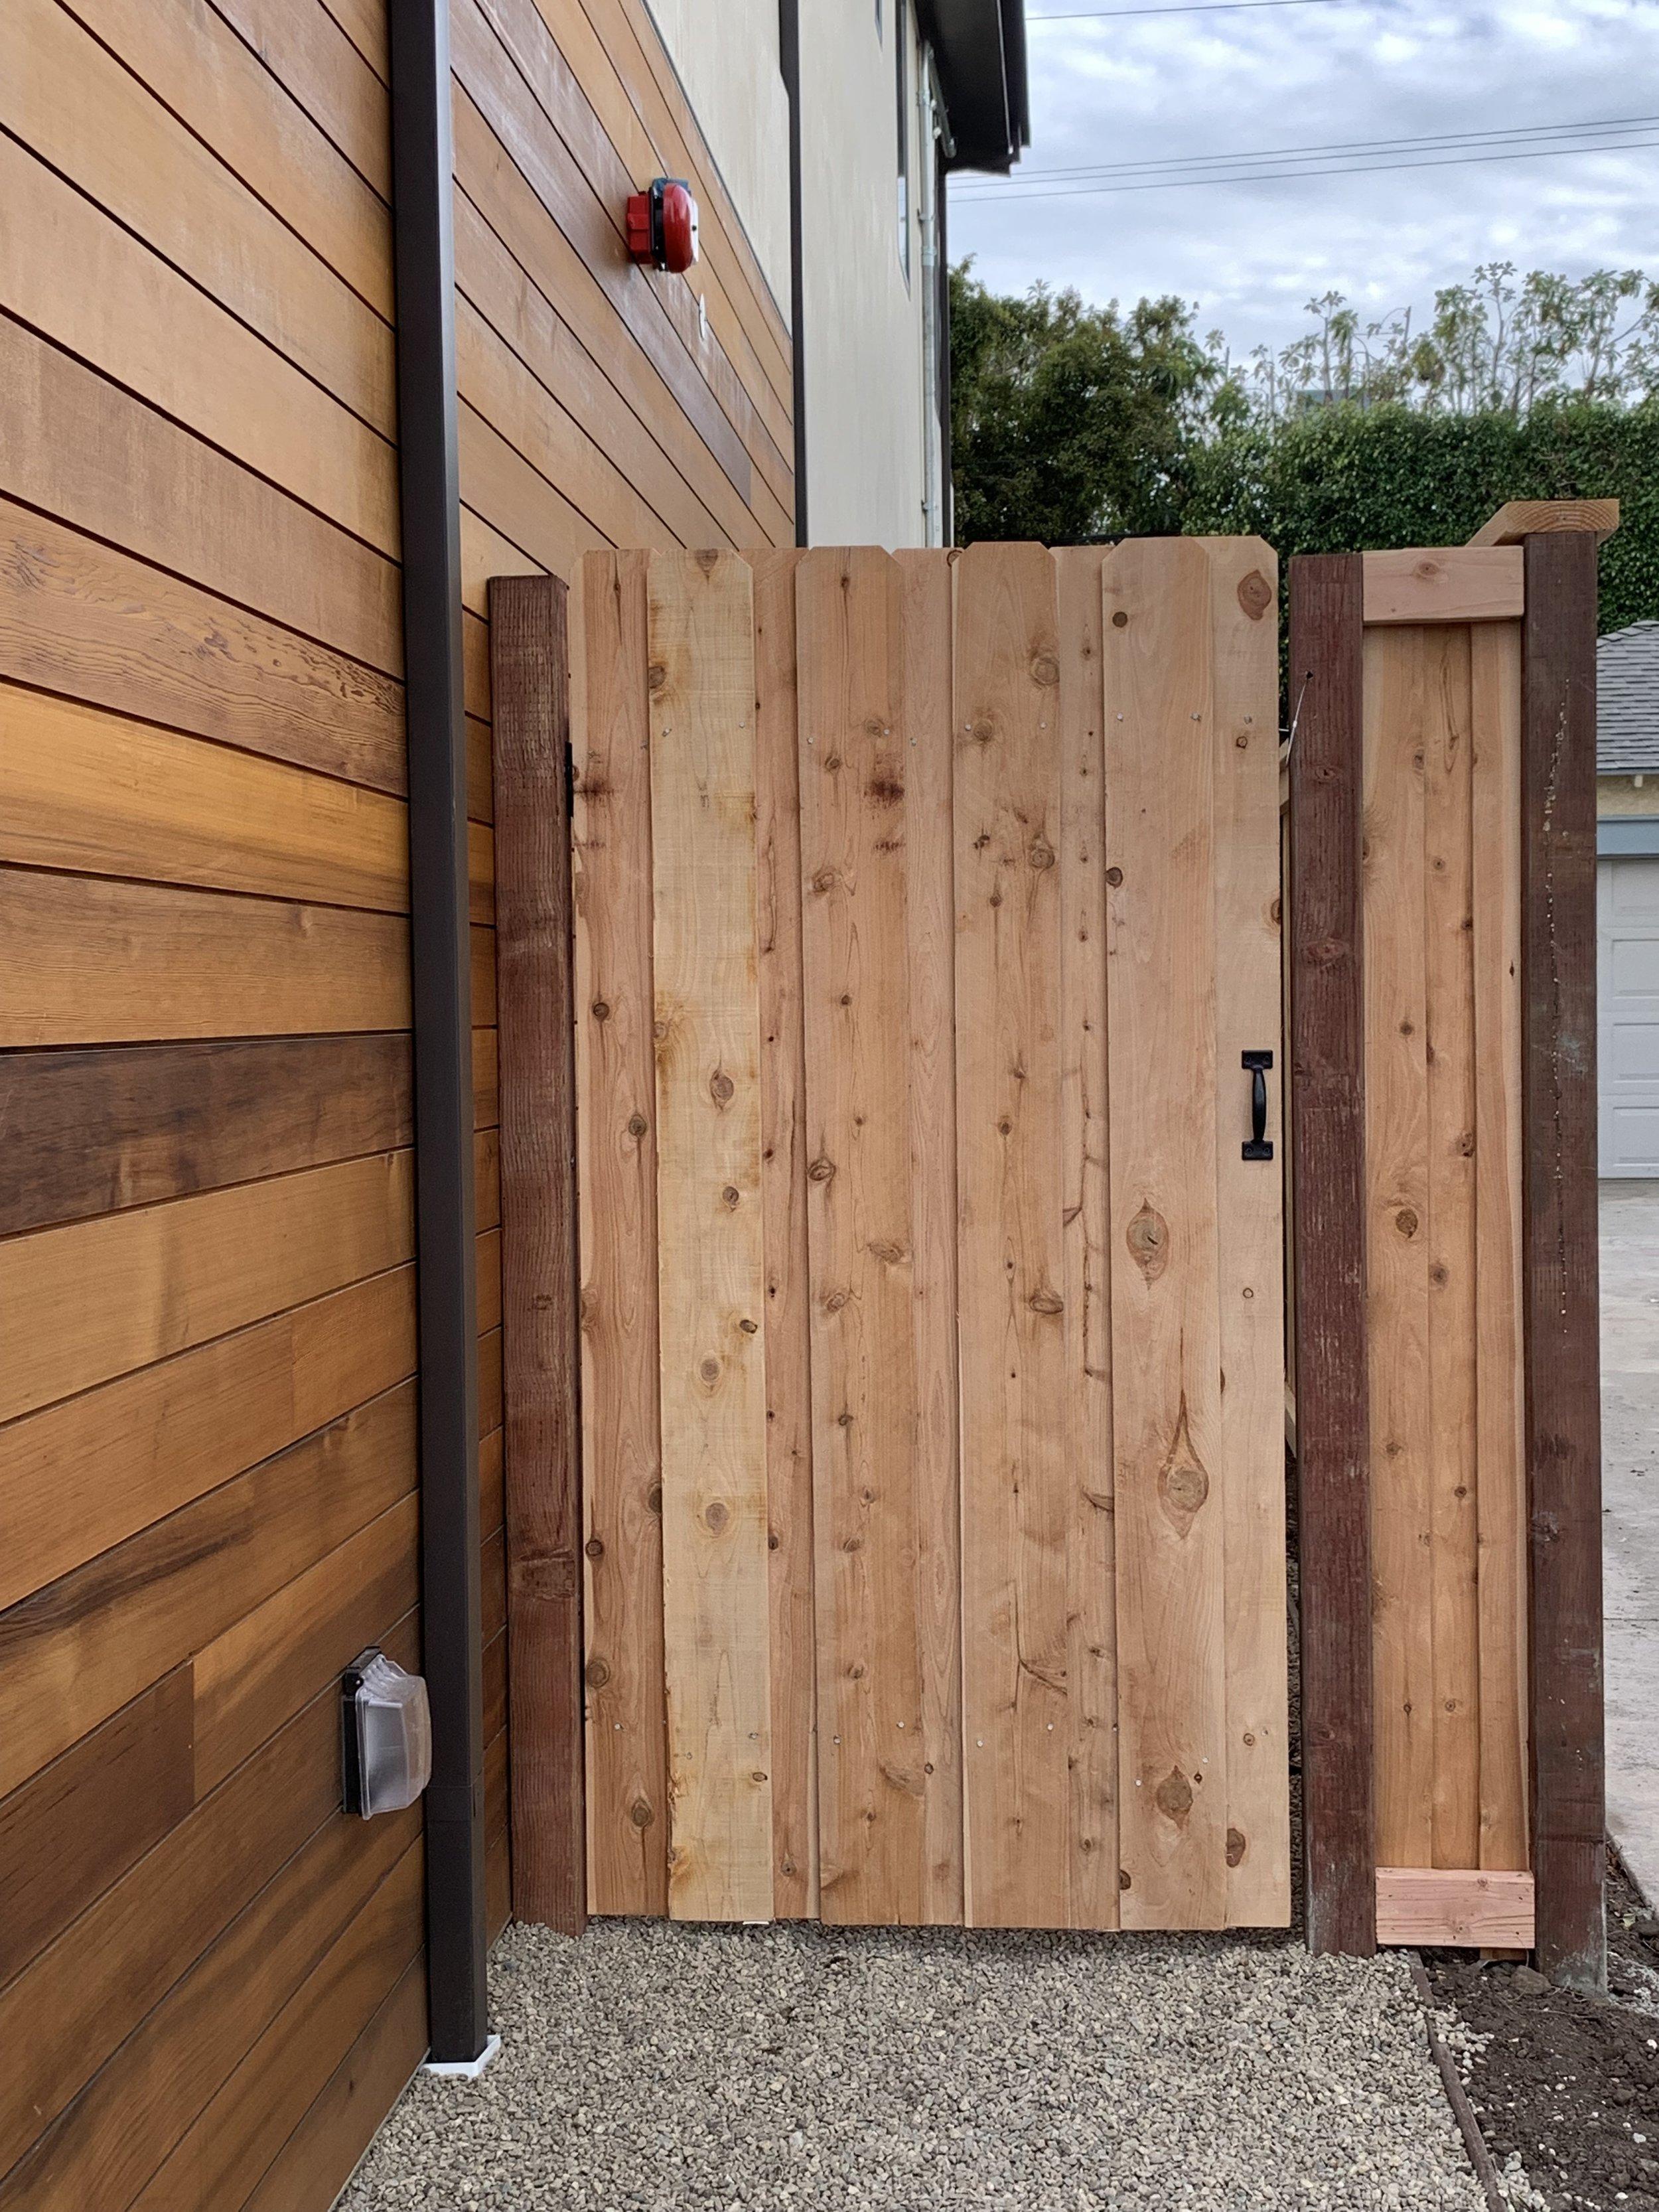 Verticla Double Sided Entry Gates.jpeg